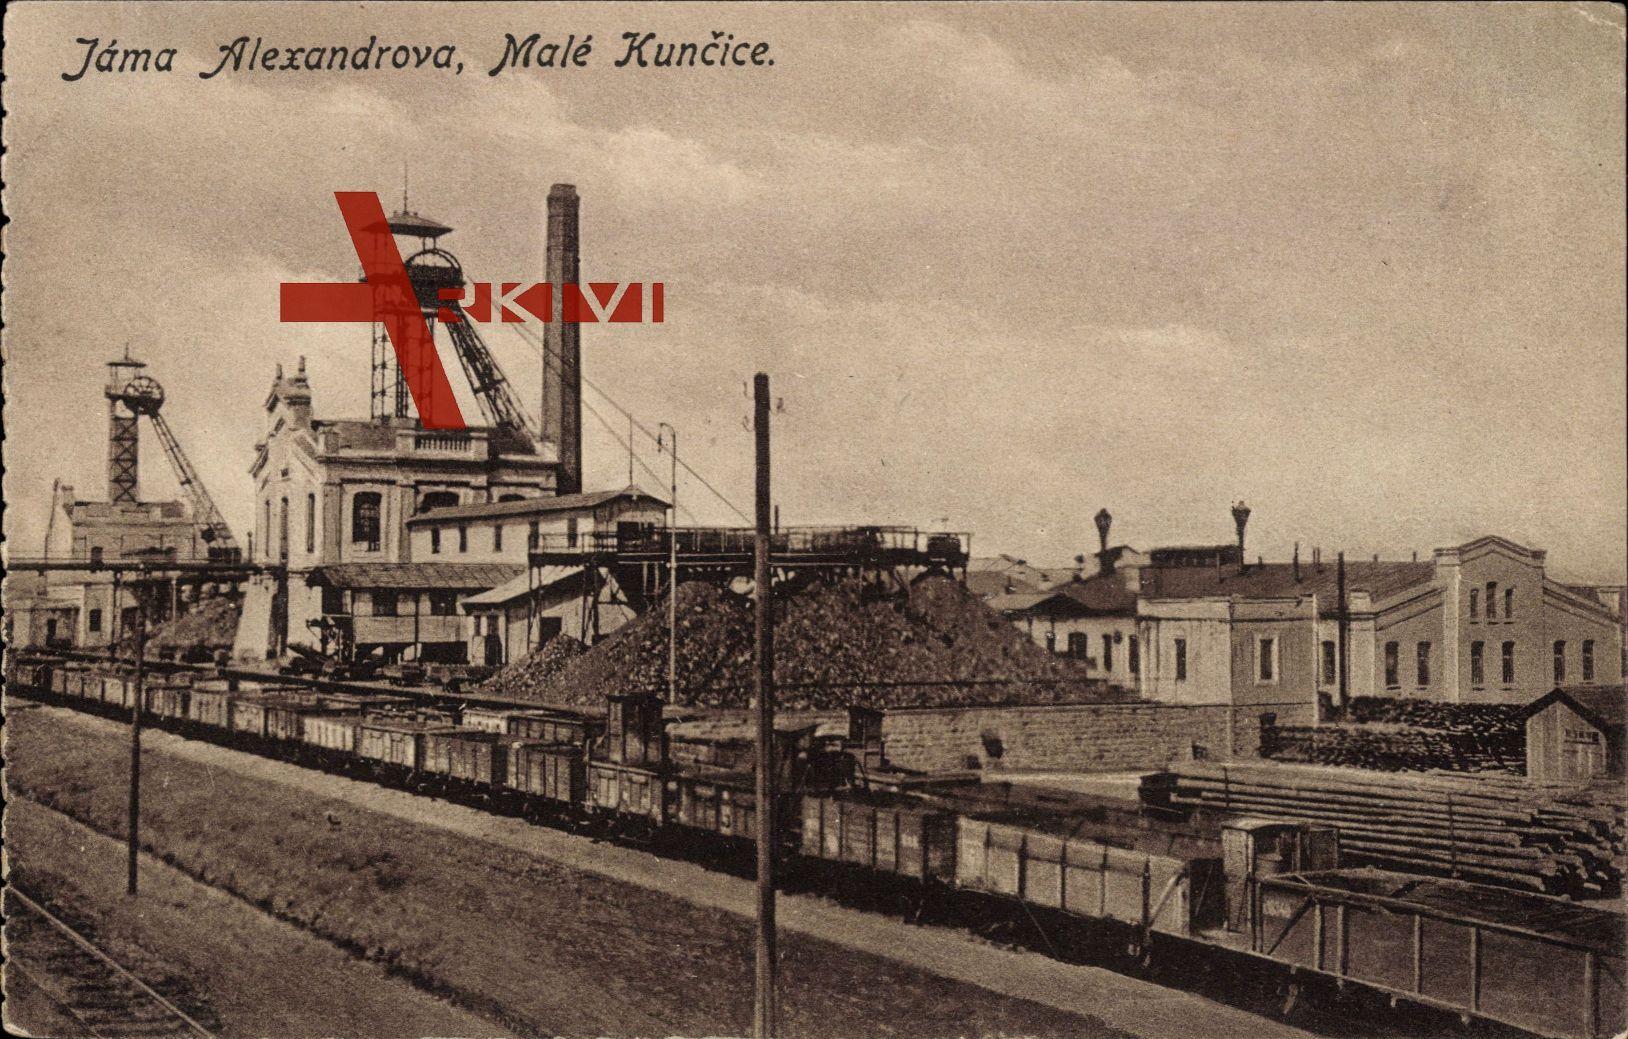 Malé Kuncice Region Königgrätz, Jáma Alexandrova, Zeche